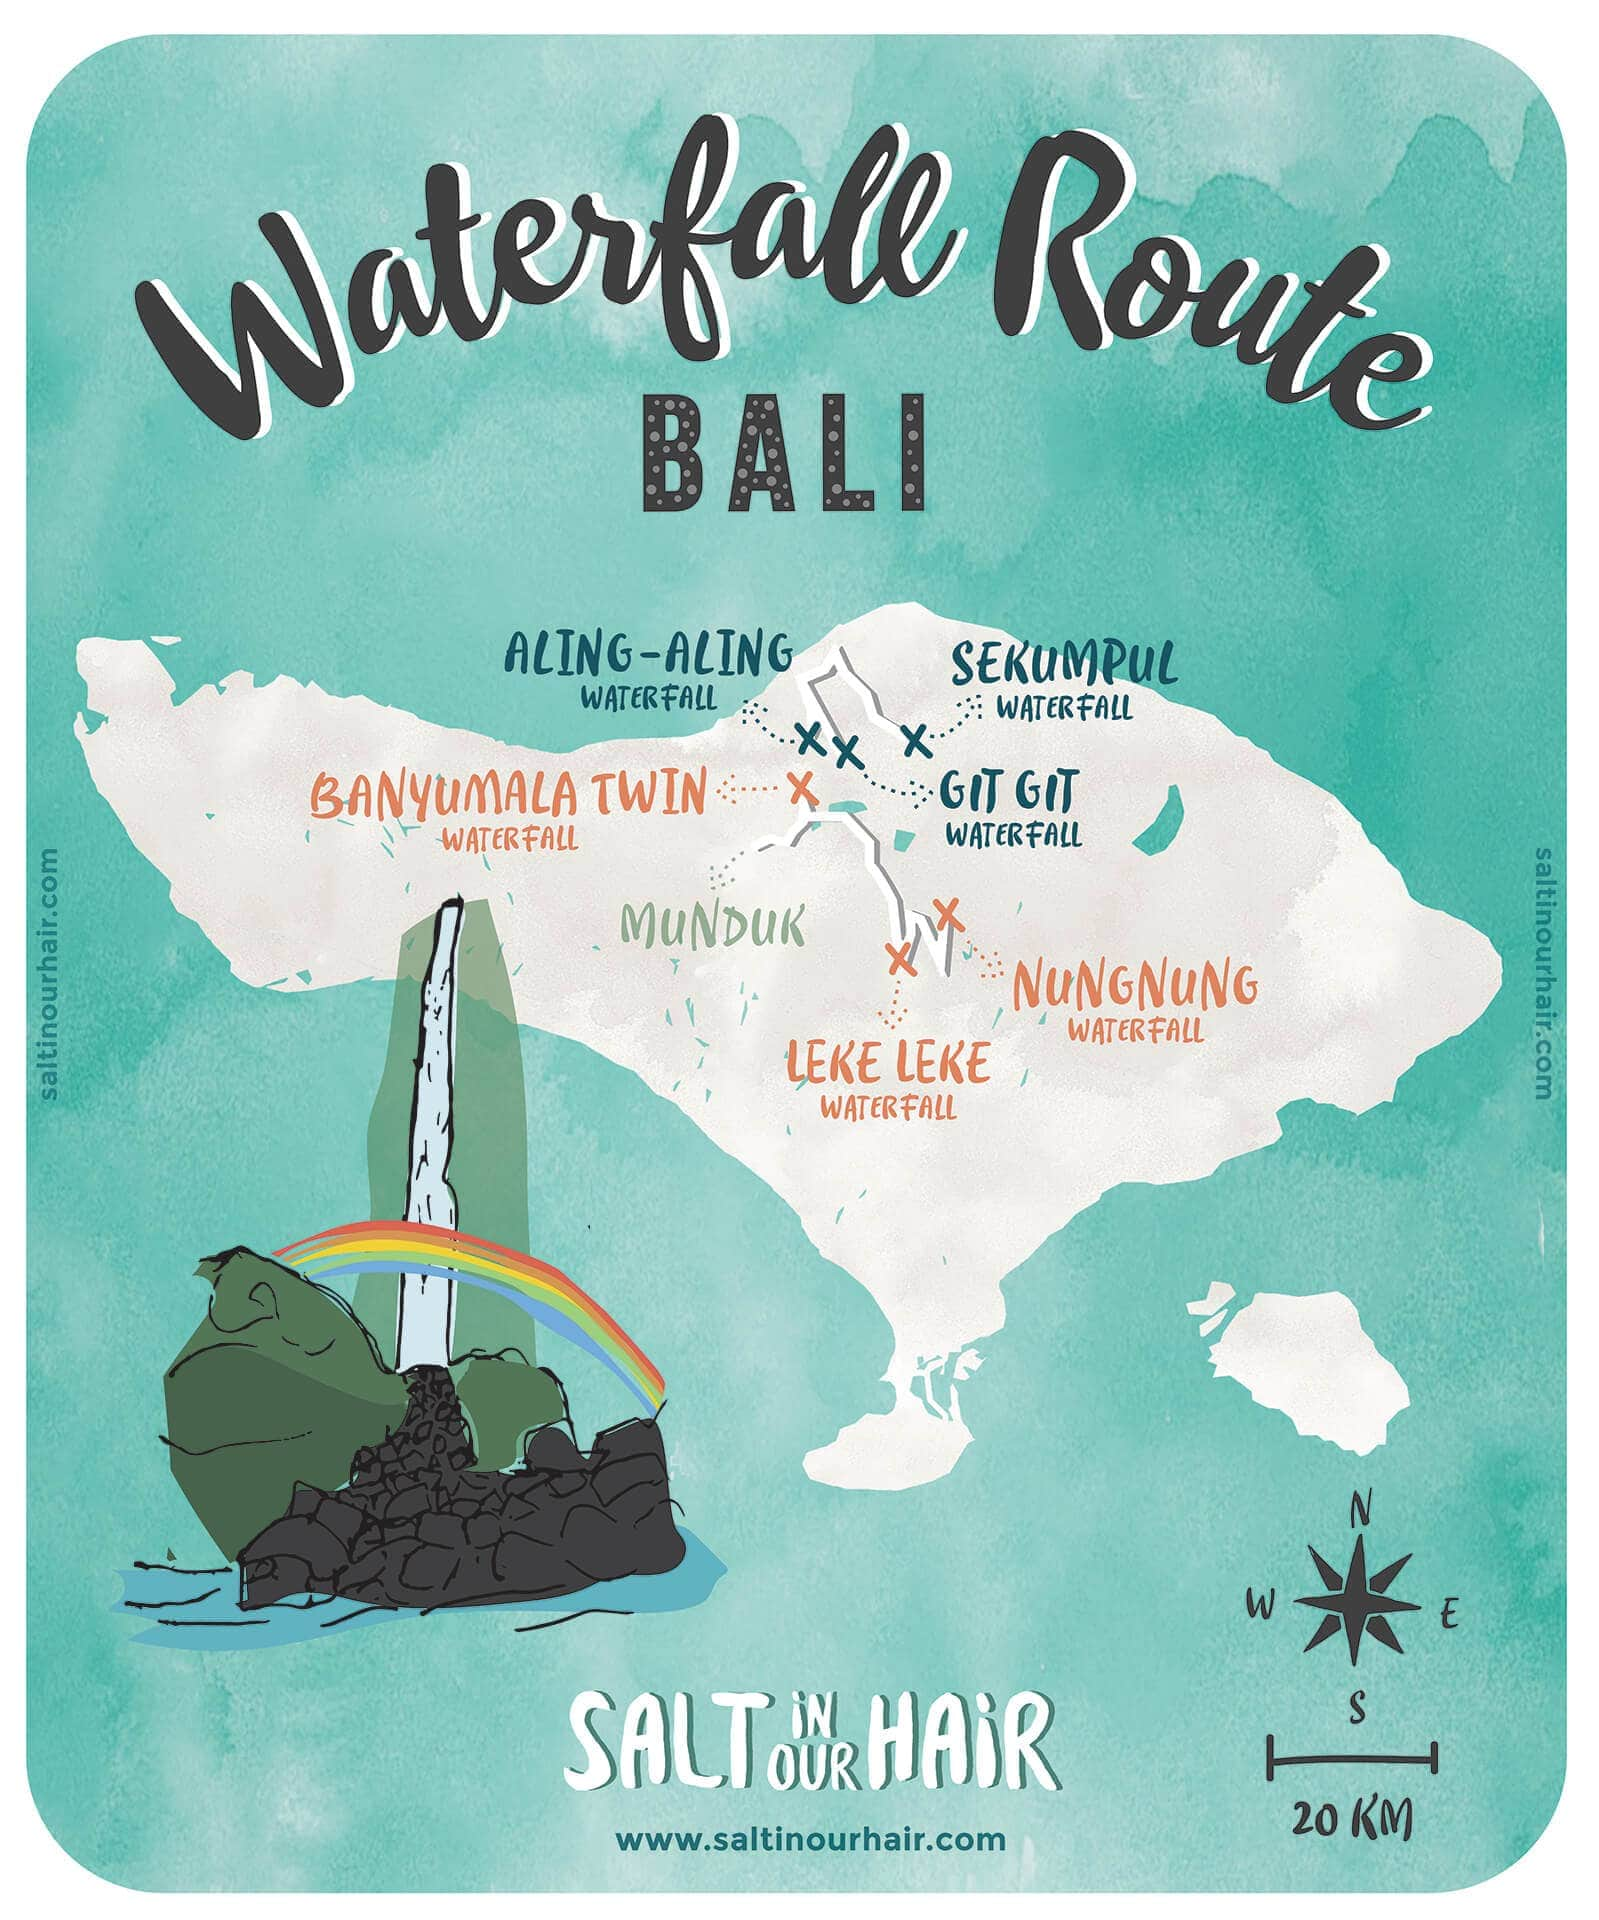 best waterfalls bali route map